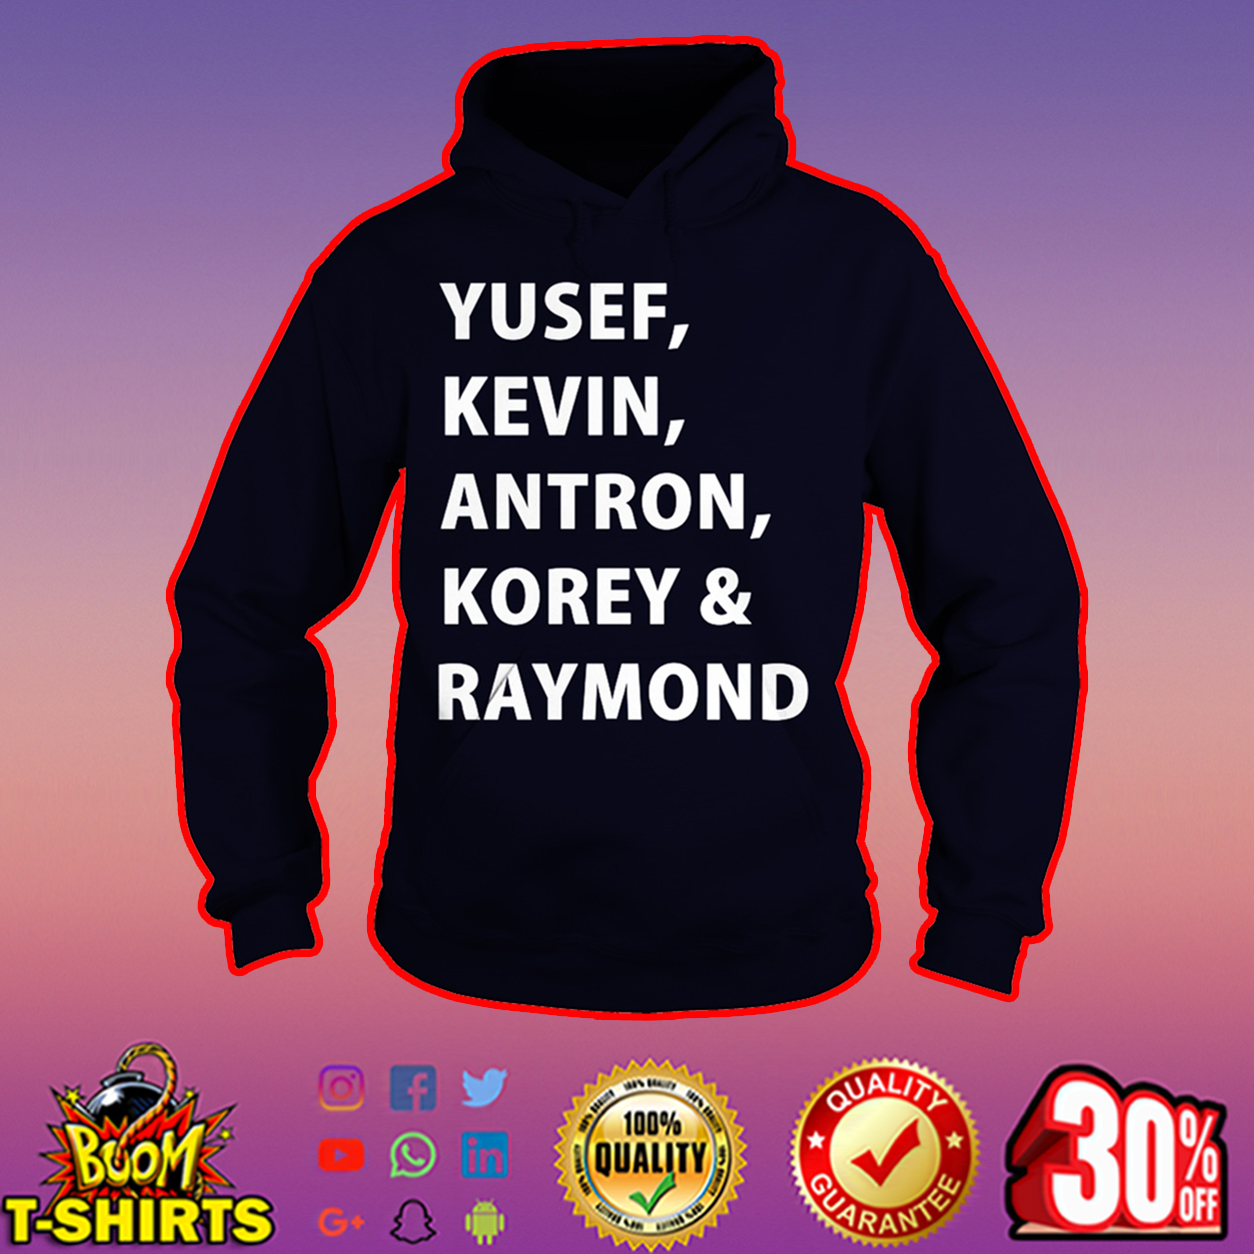 Yusef Kevin Antron Korey and Raymond hoodie